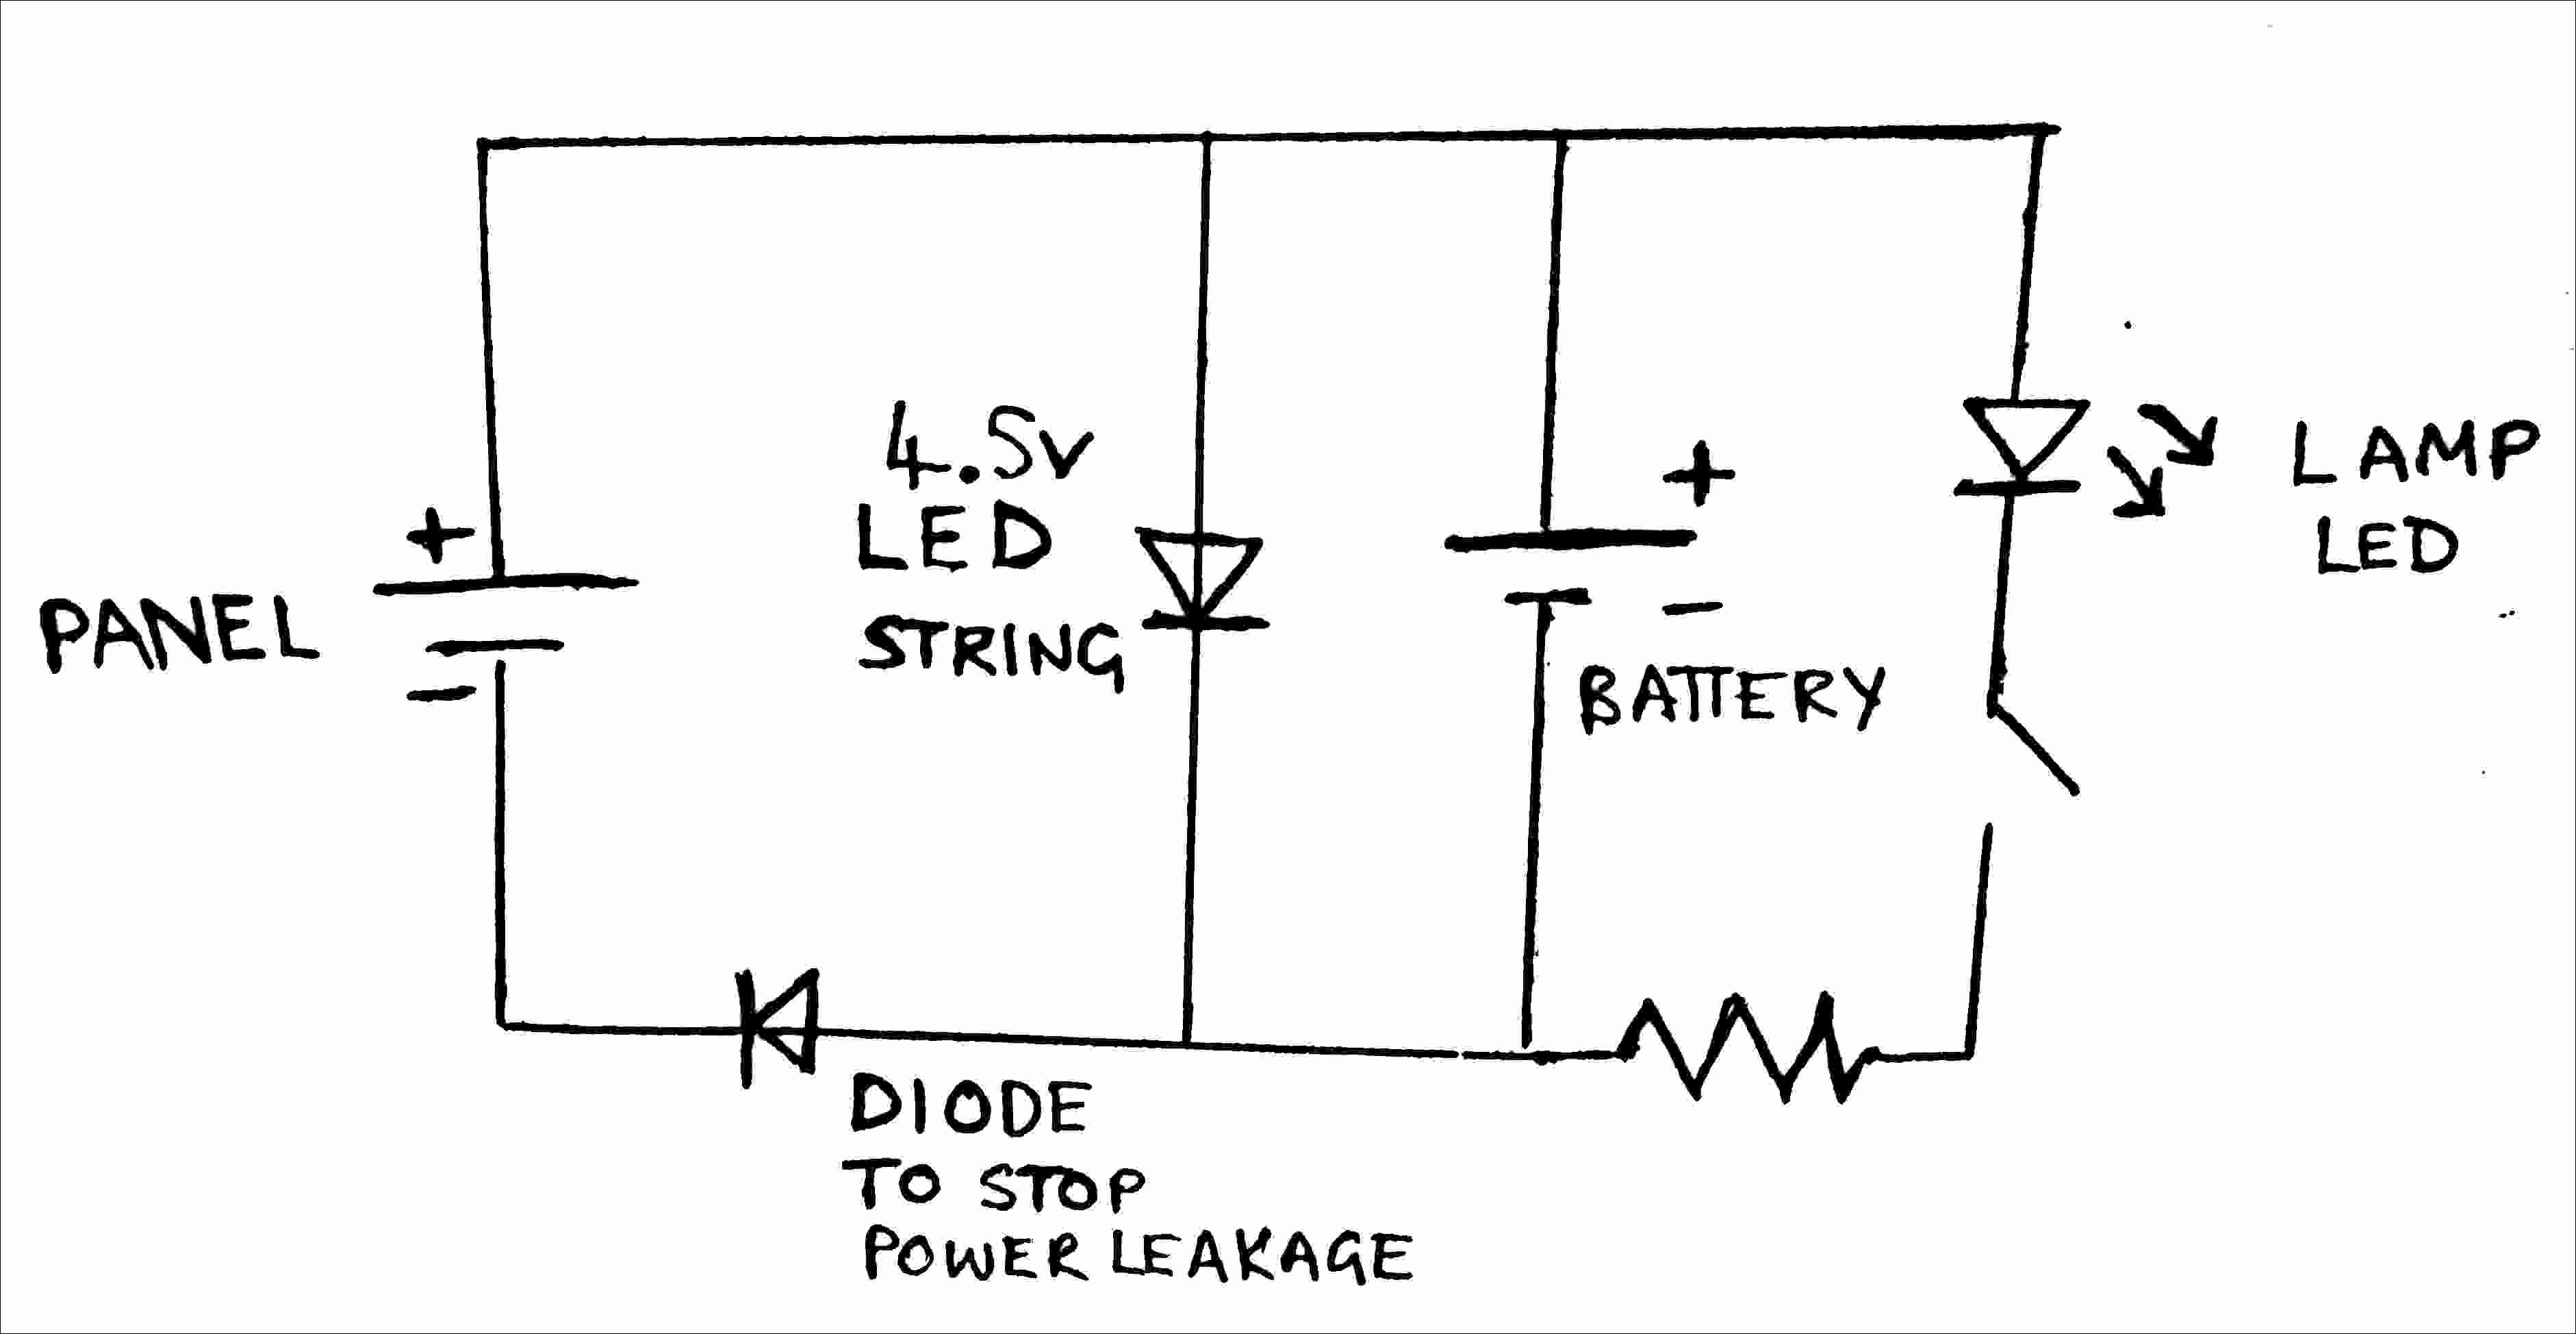 Led Light Wiring Diagram Awesome Led Light Bulbs Circuit Zoom with Led Light Bulbs Circuit Stunning